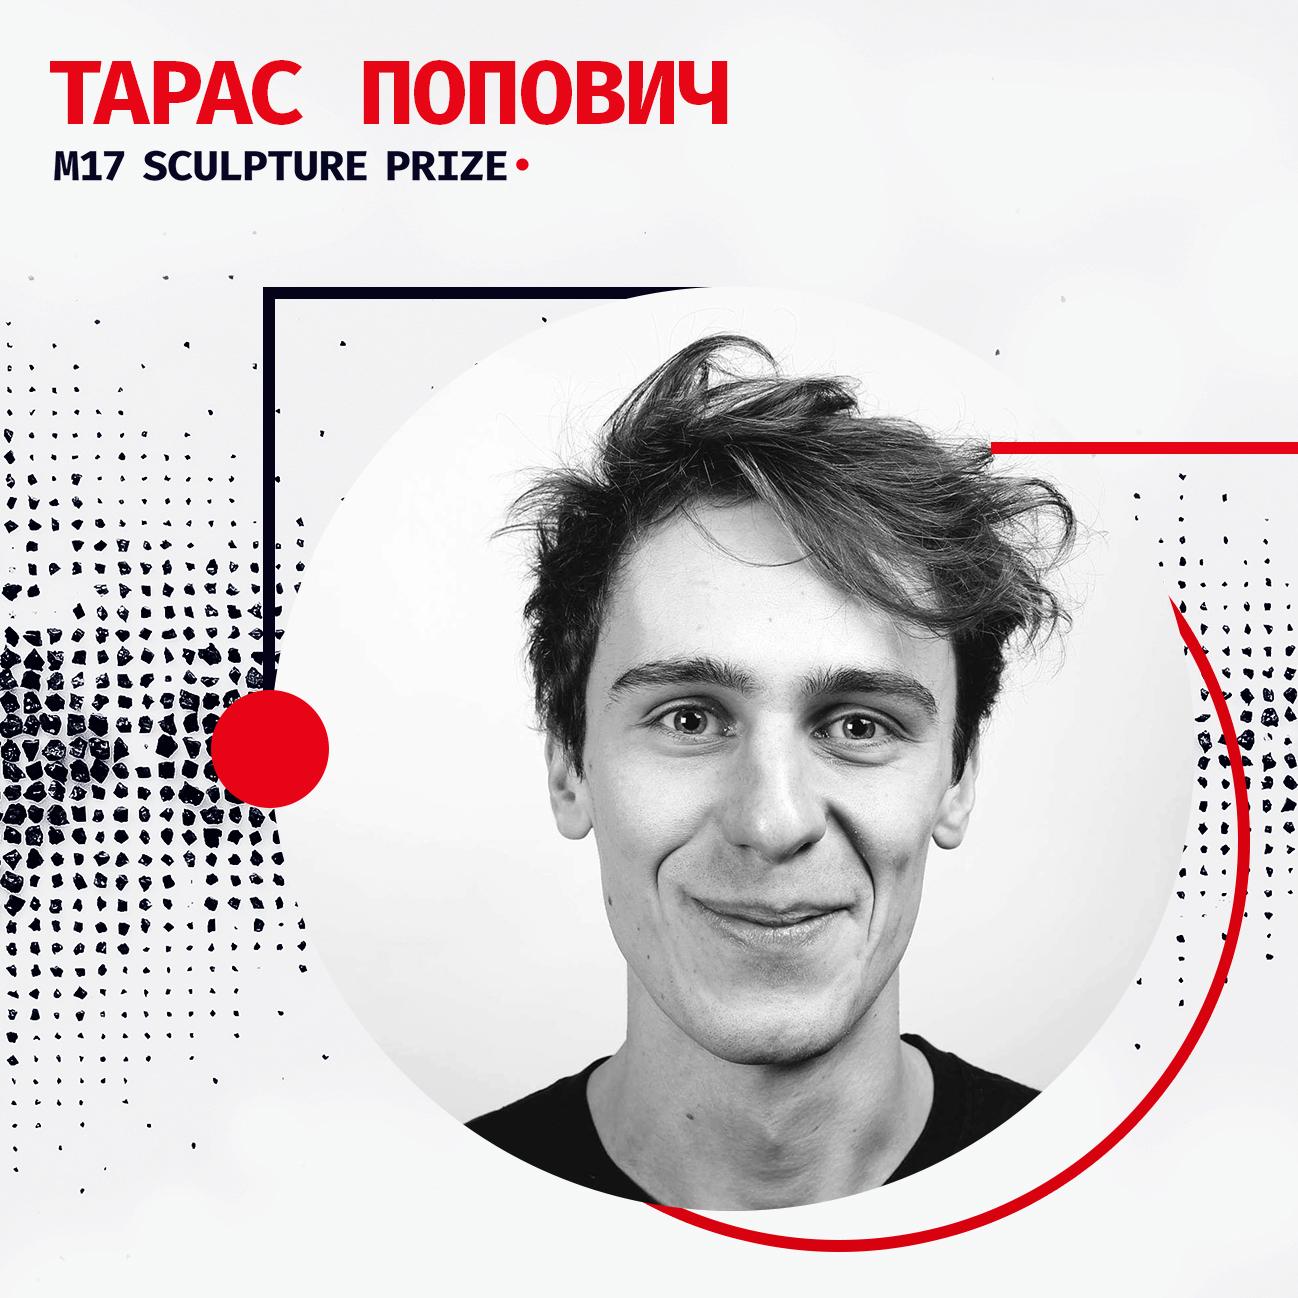 M17 Sculpture Prize nominees: Taras Popovych (Lviv)